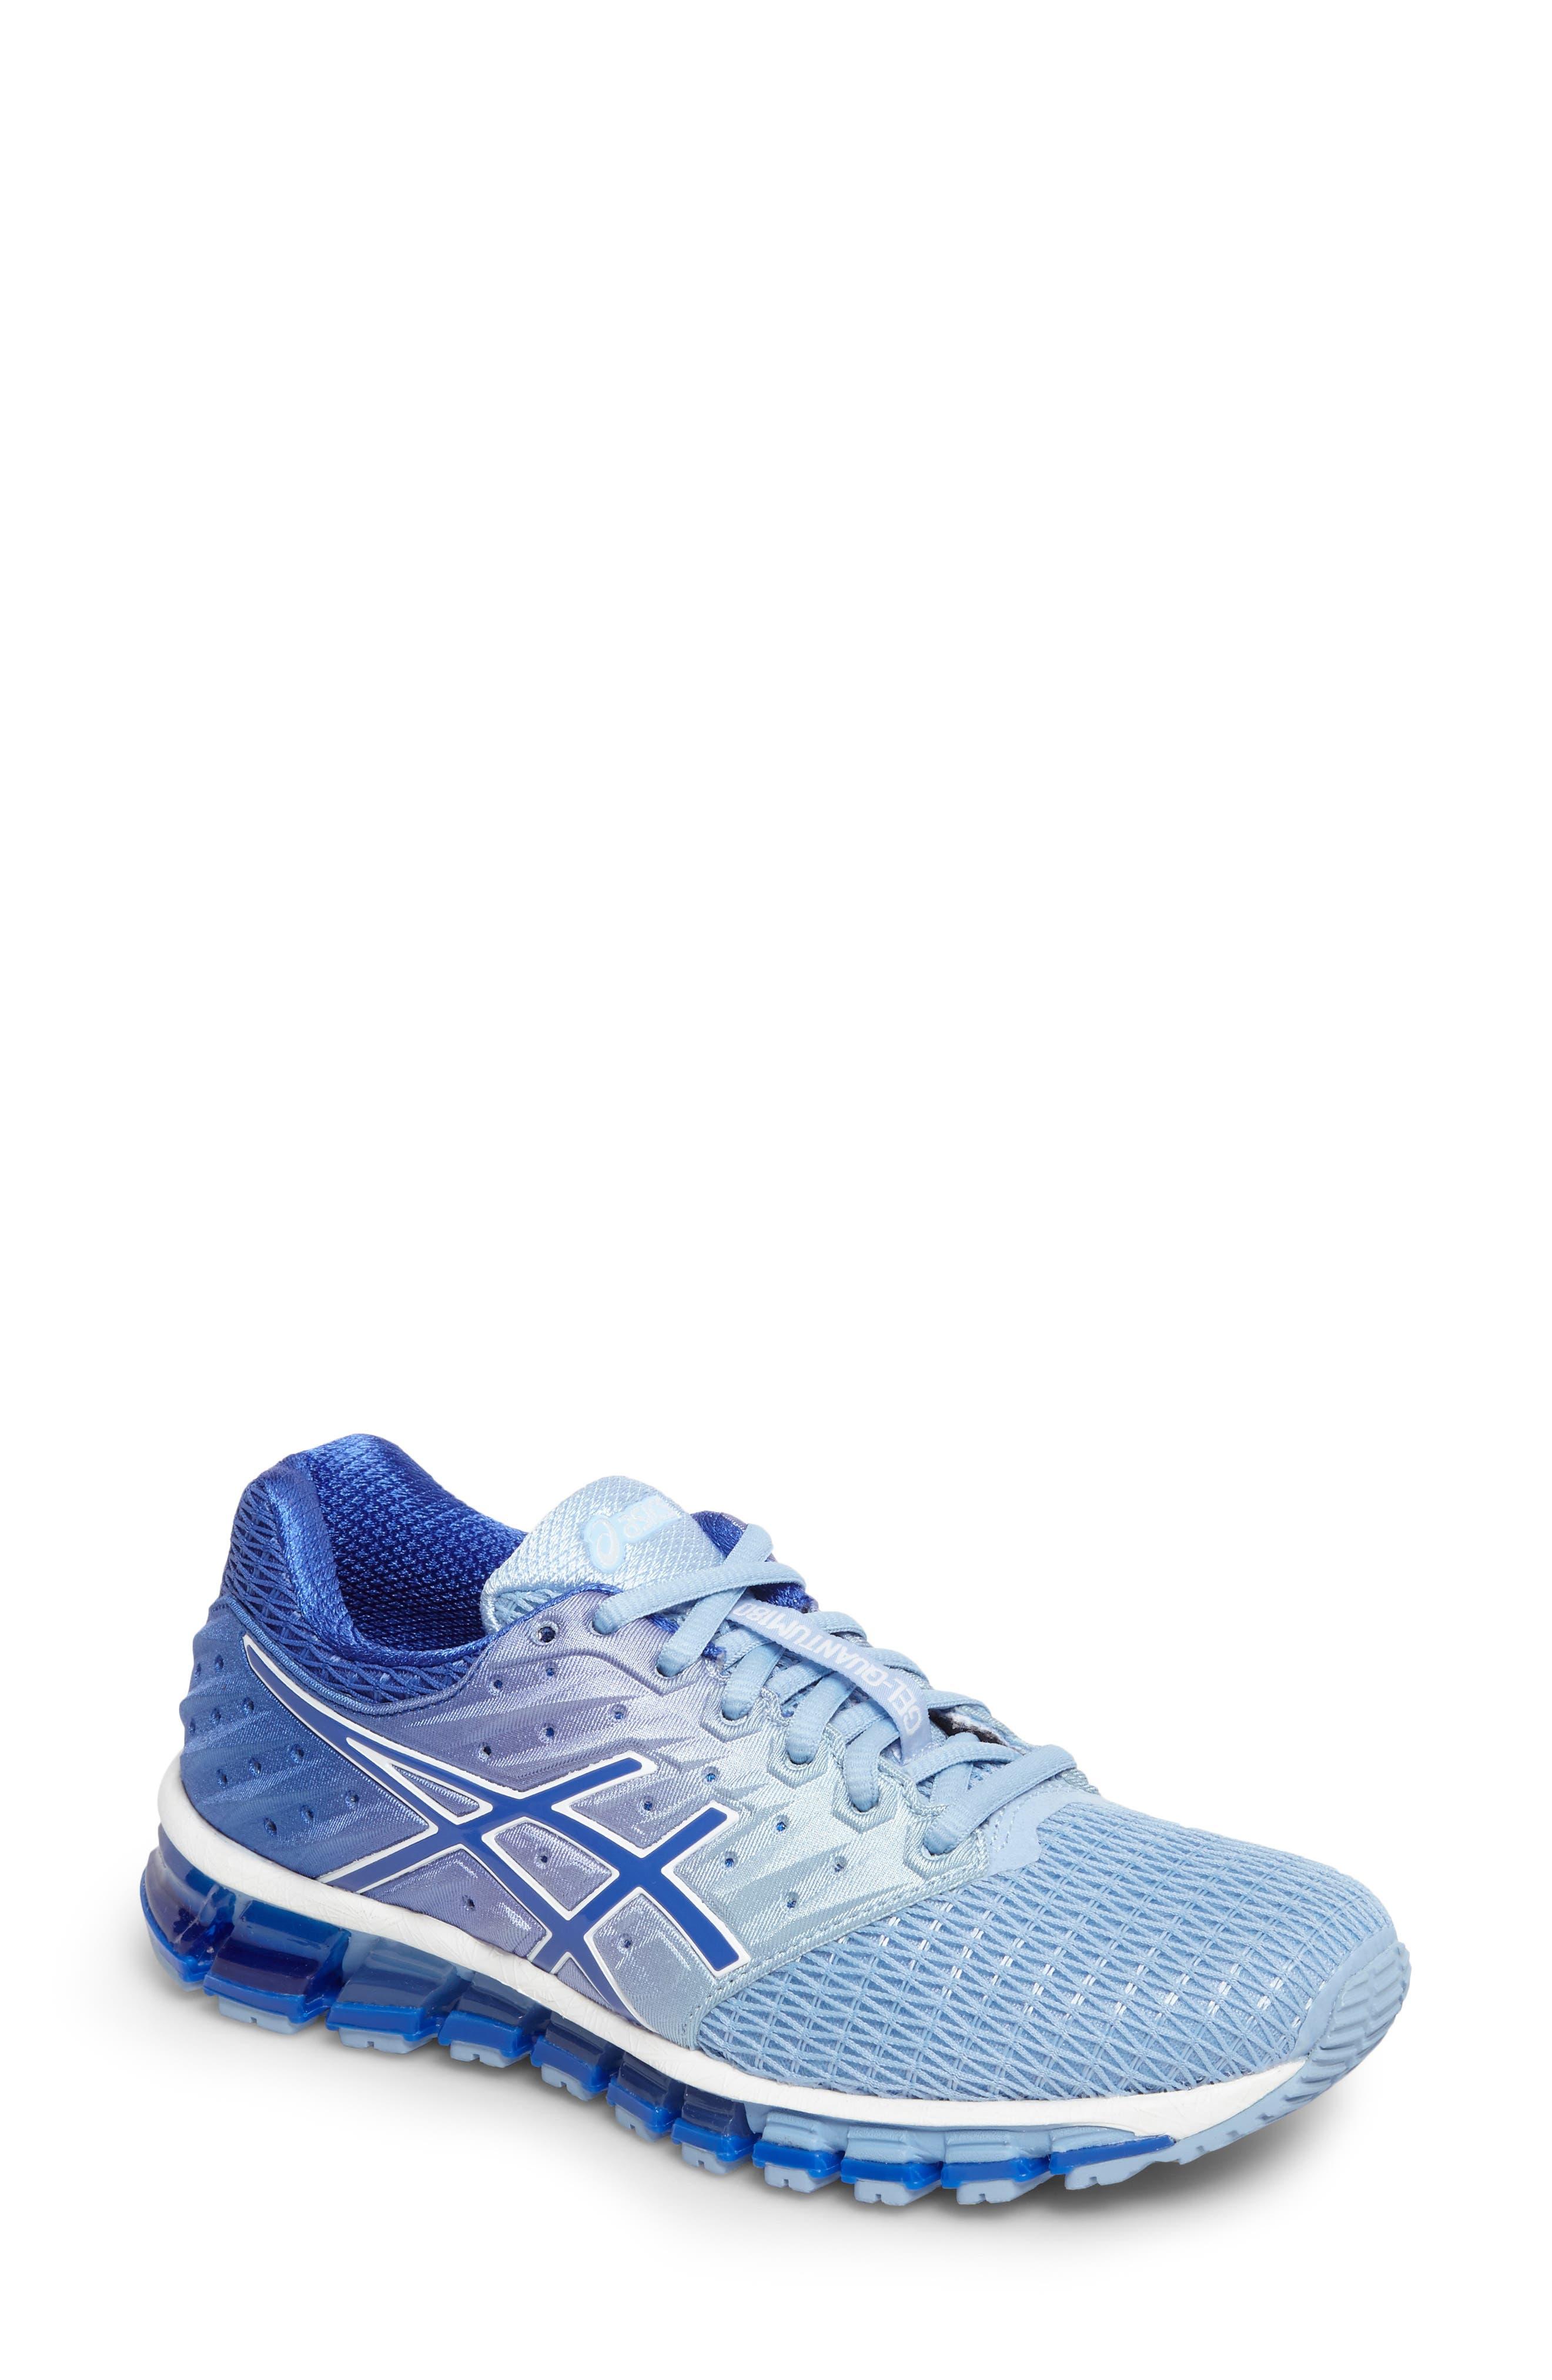 Alternate Image 1 Selected - ASICS® 'GEL-Quantum 180 2' Running Shoe (Women)